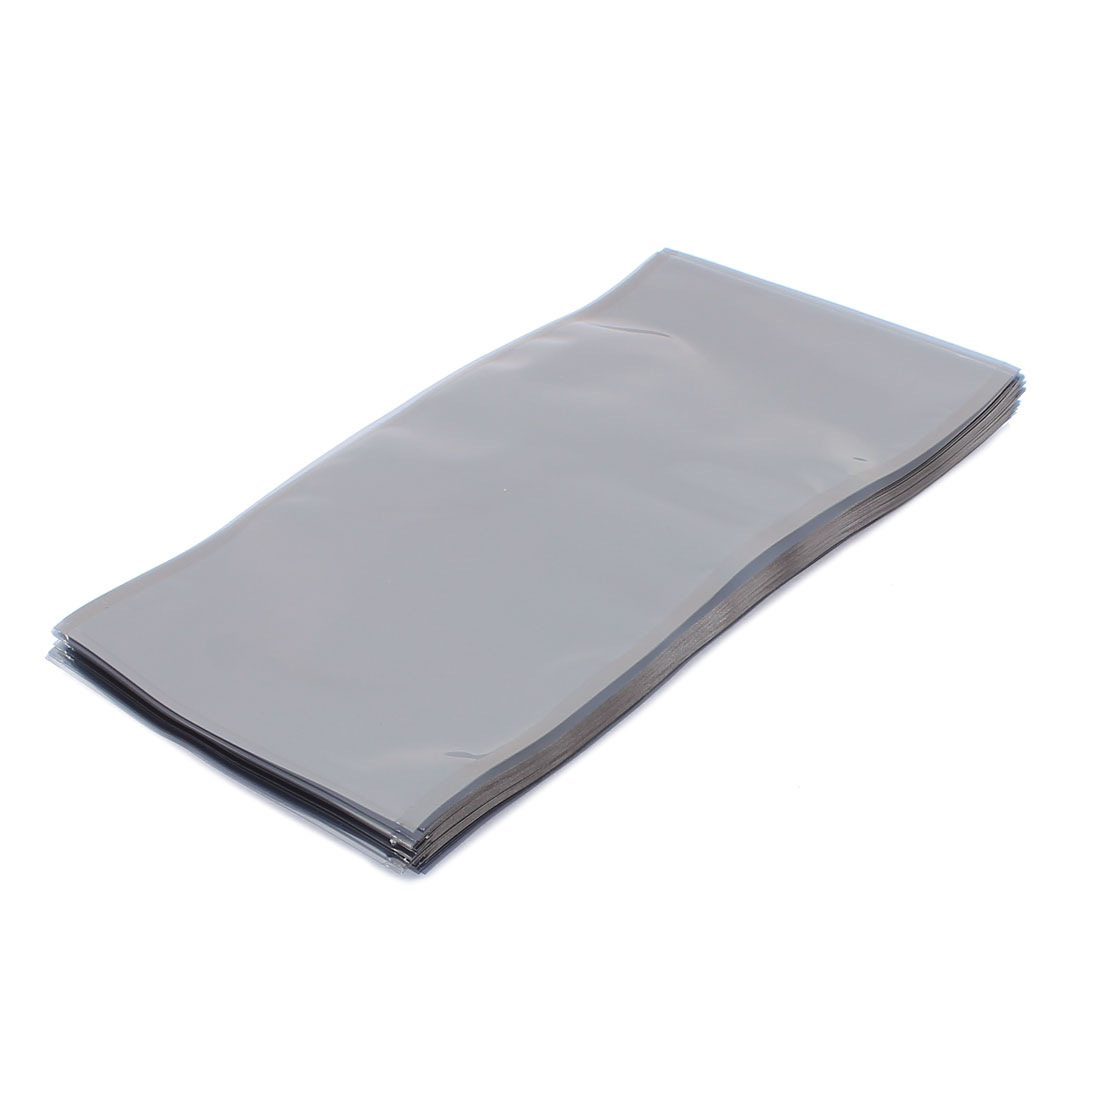 50 Pcs 110mm x 200mm Silver Tone Flat Open Top Anti Static Bag For Electronics